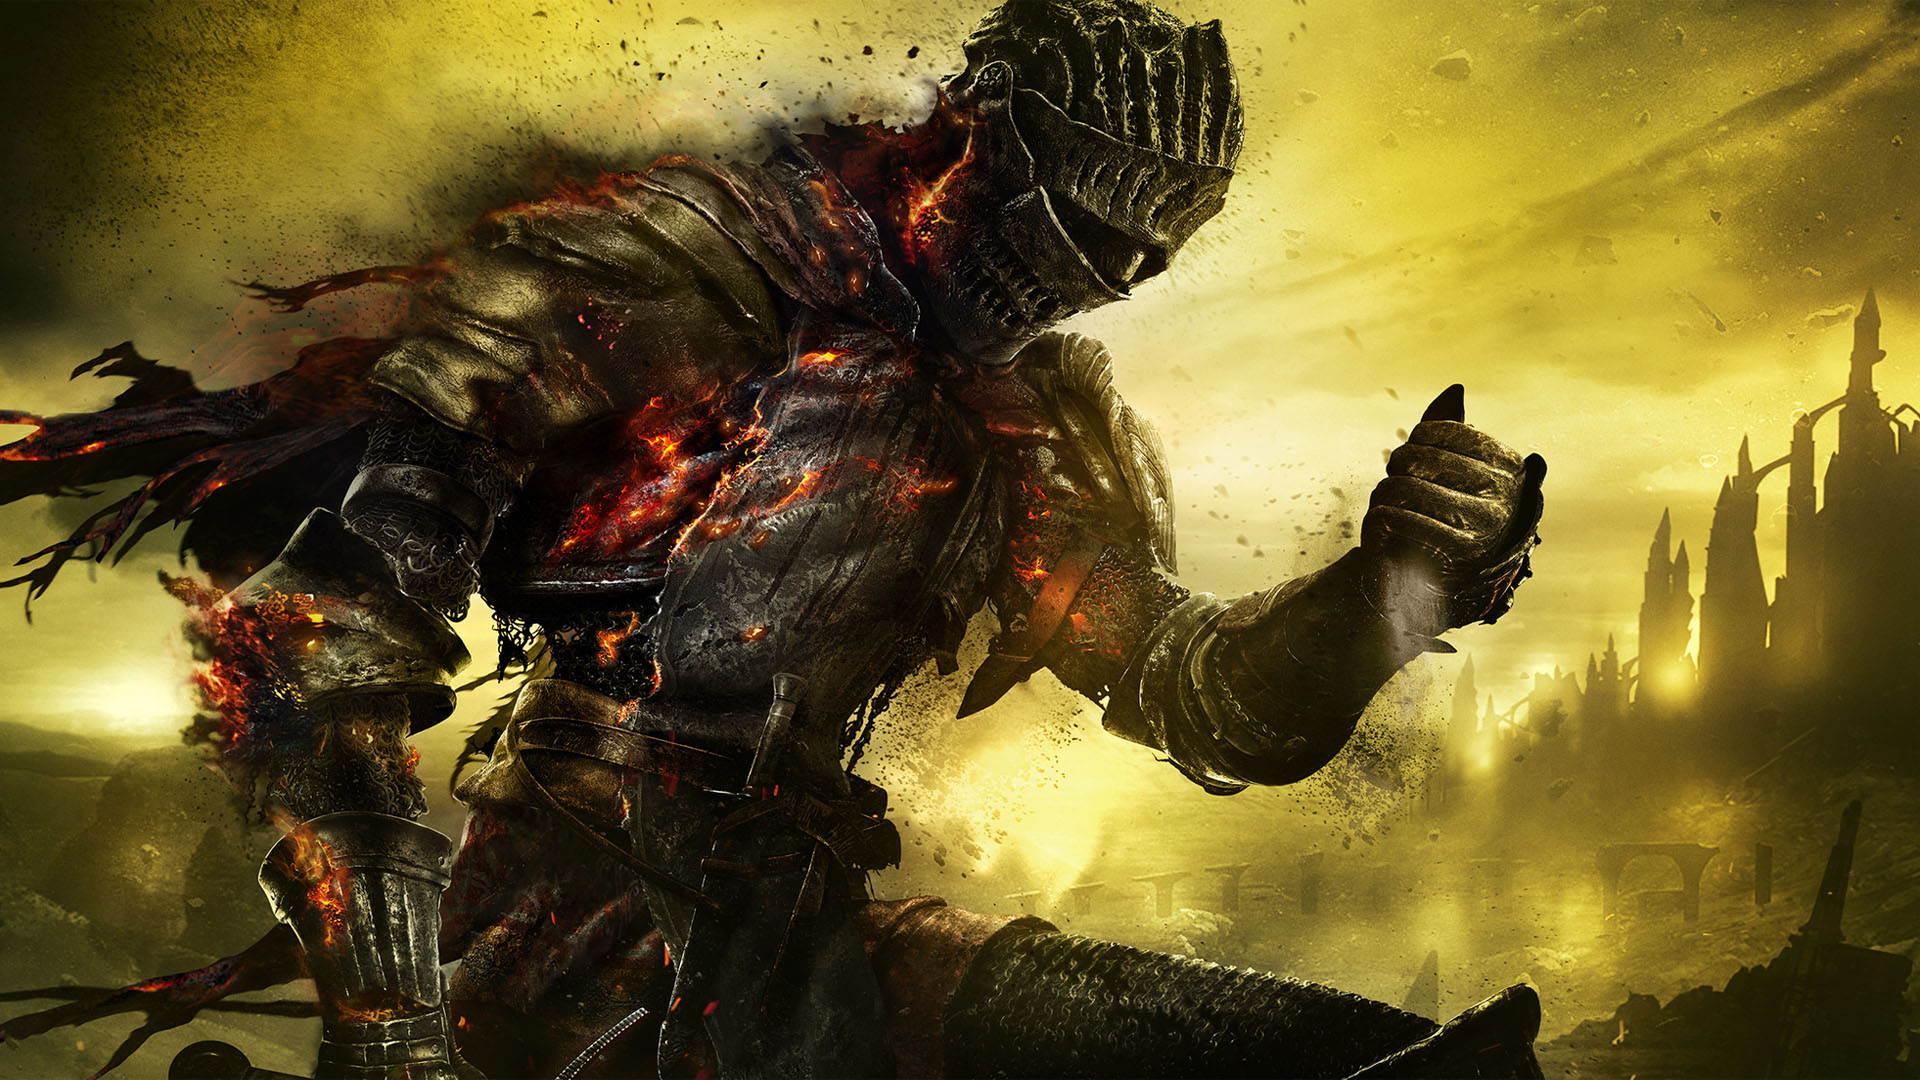 Download Dark Souls III 2015 Game HD Wallpaper Search more Games high 1920x1080